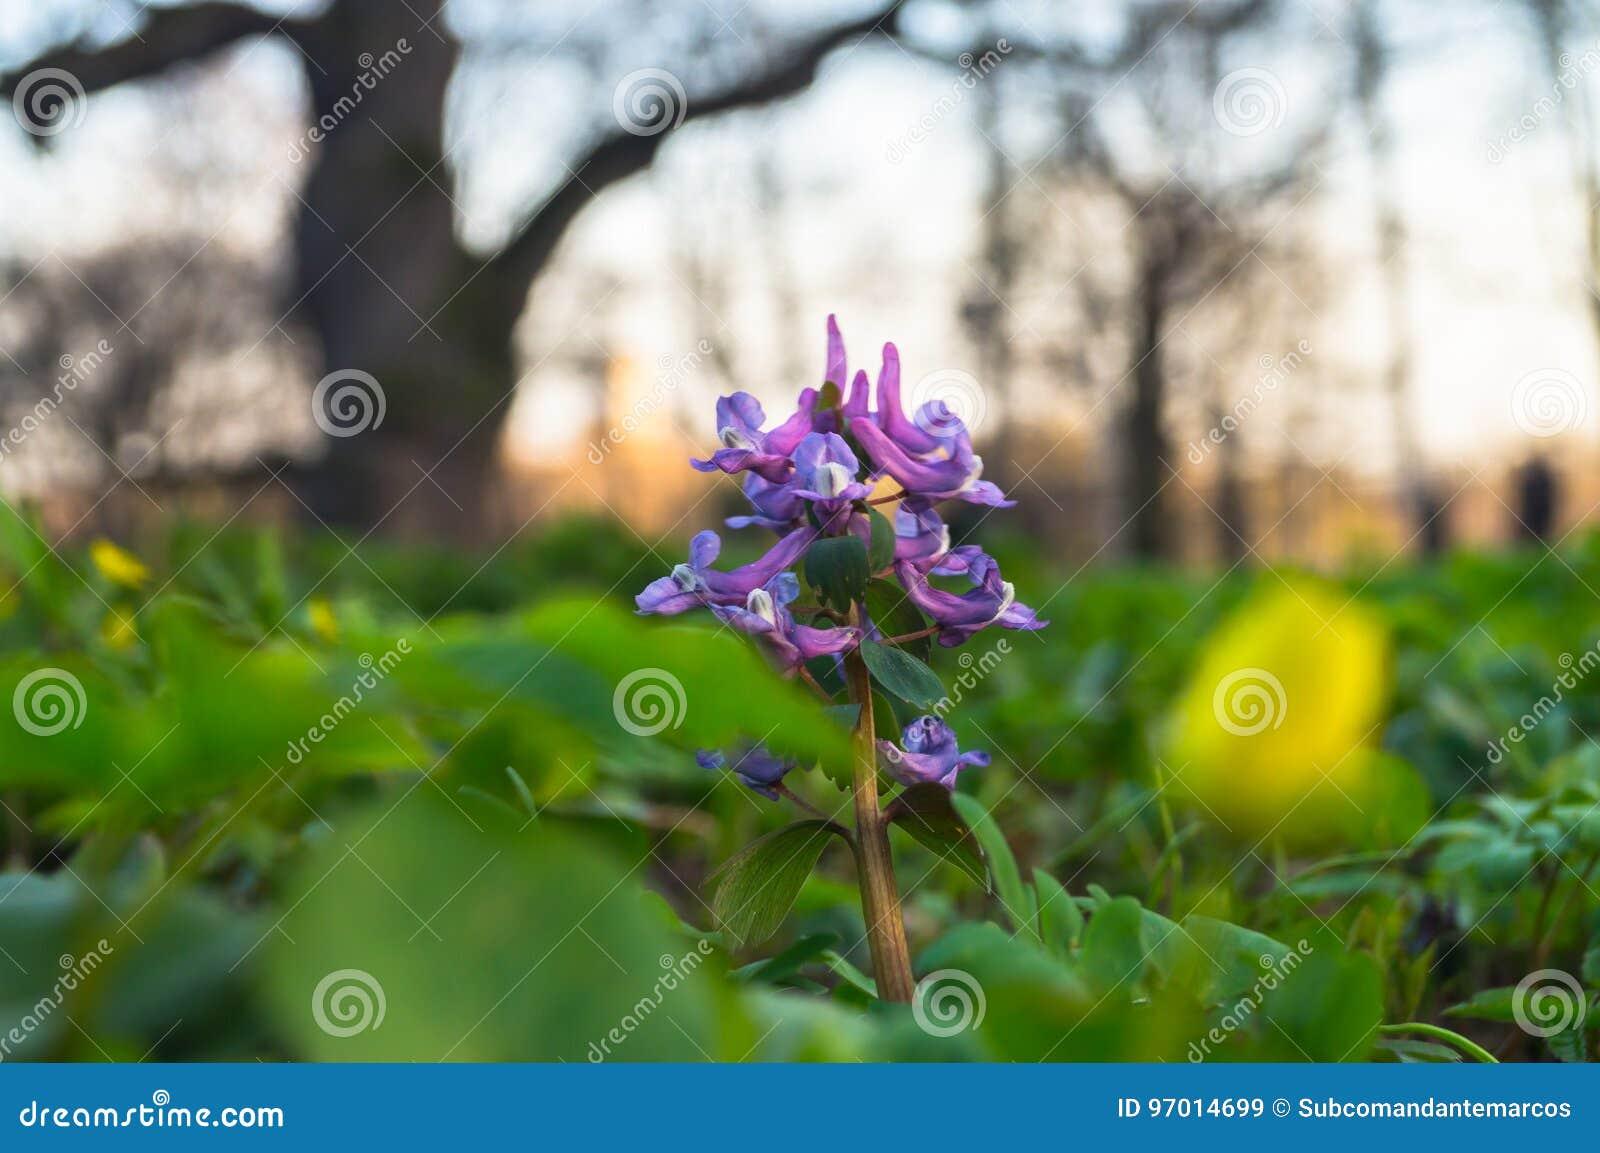 First spring flowers of corydalis hollow root on the sunset download first spring flowers of corydalis hollow root on the sunset background with huge oak mightylinksfo